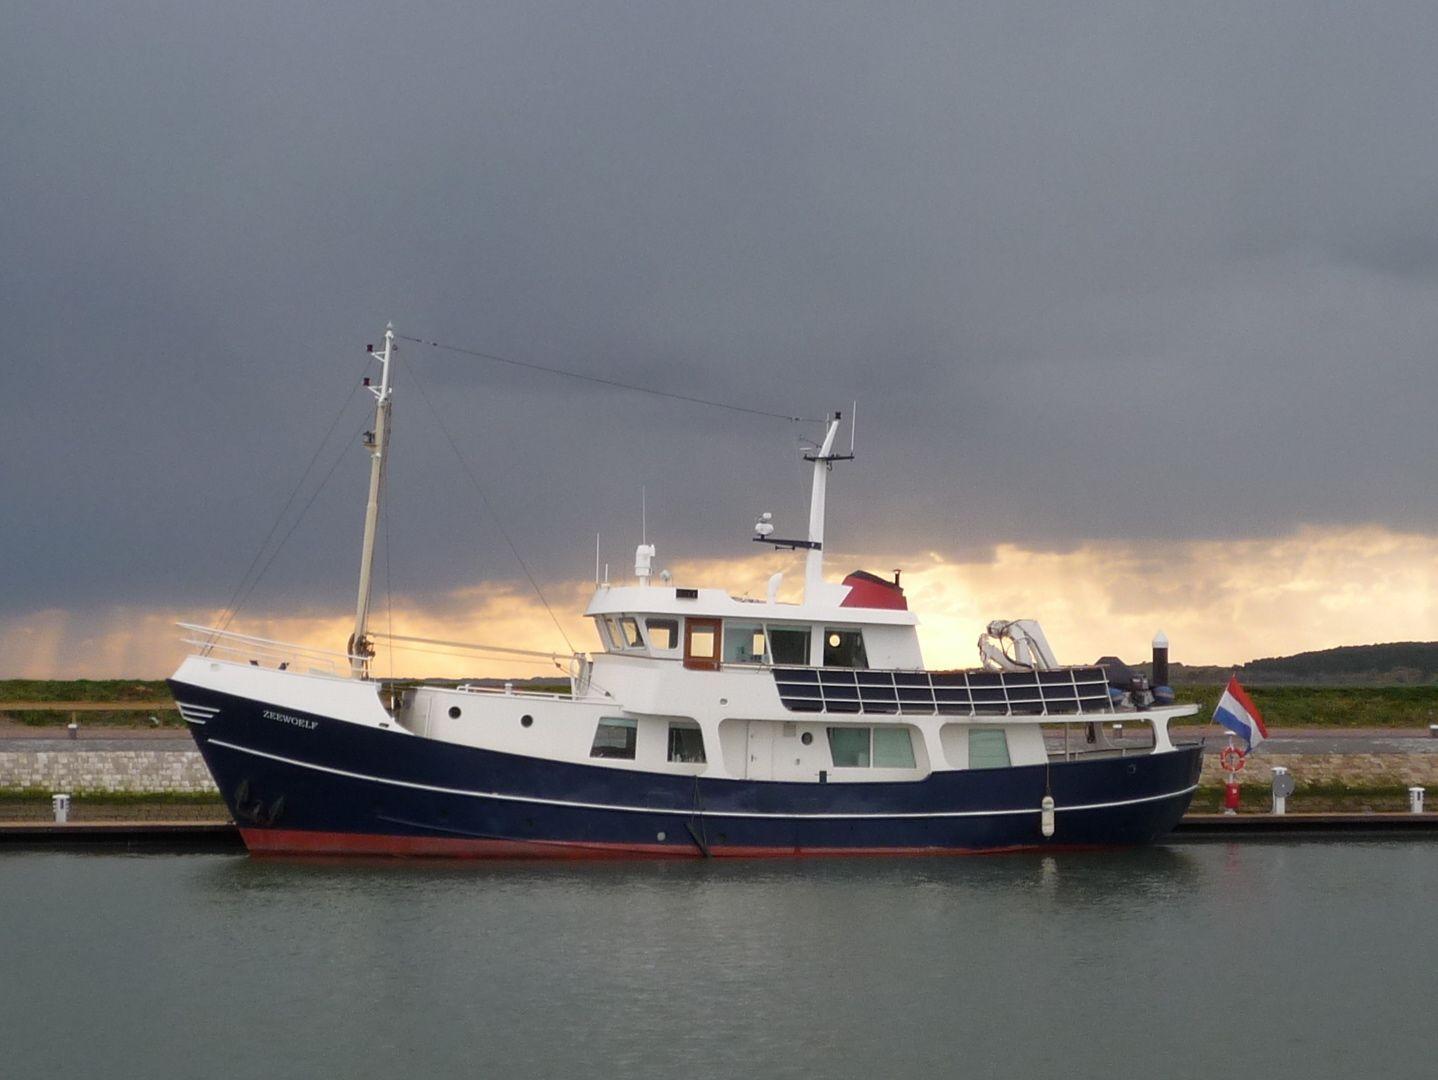 Trawler Yachts Used Trawler Yachts For Sale Vehigle